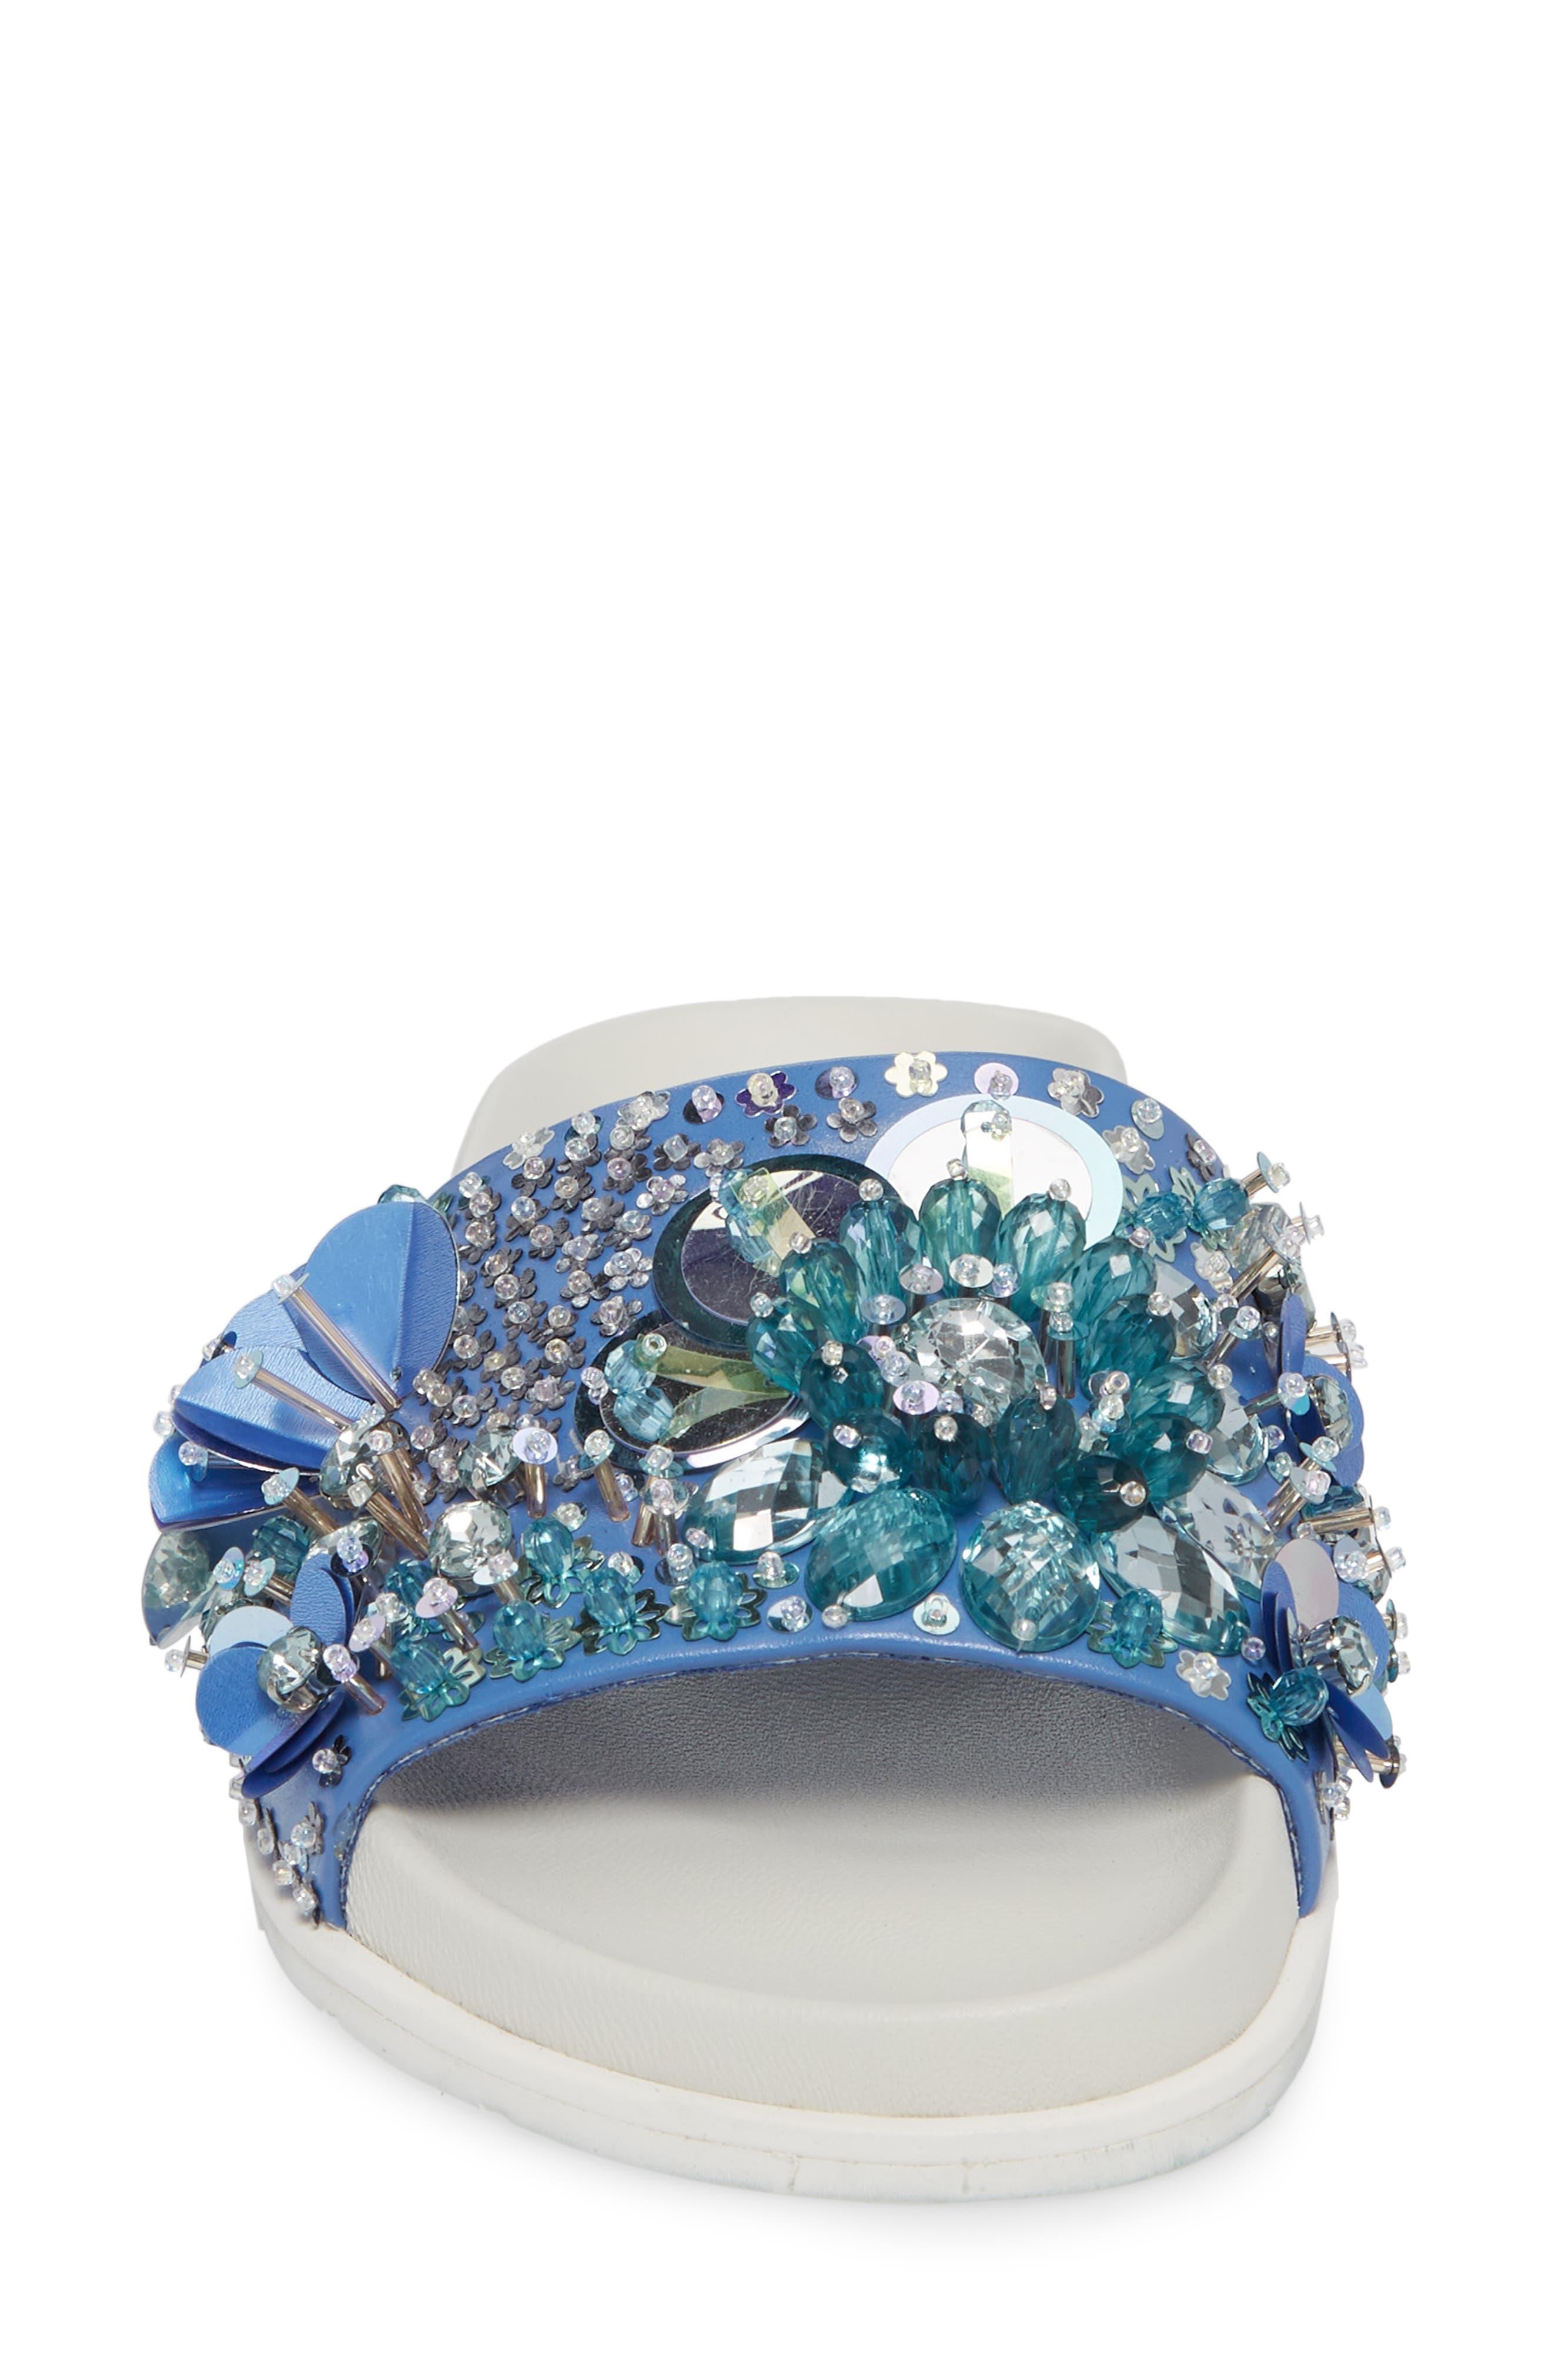 Xenia Sequin Embellished Sandal,                             Alternate thumbnail 4, color,                             Blue Multi Fabric